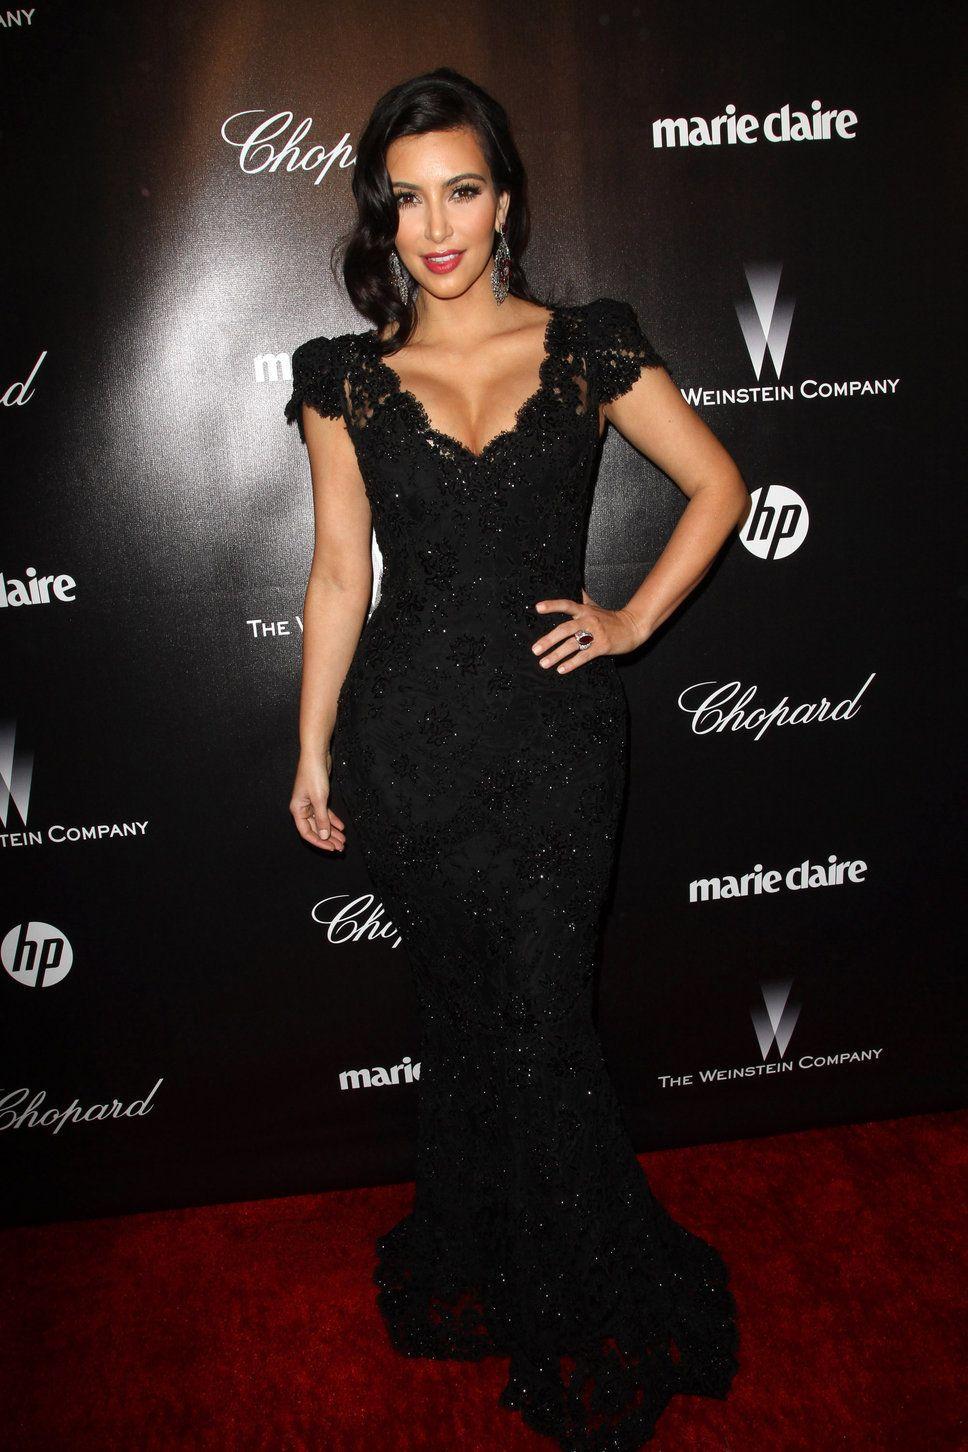 Black dress with red lipstick - Kim Kardashian Black Lace Maxi Dress Hollywood Curls Red Lipstick